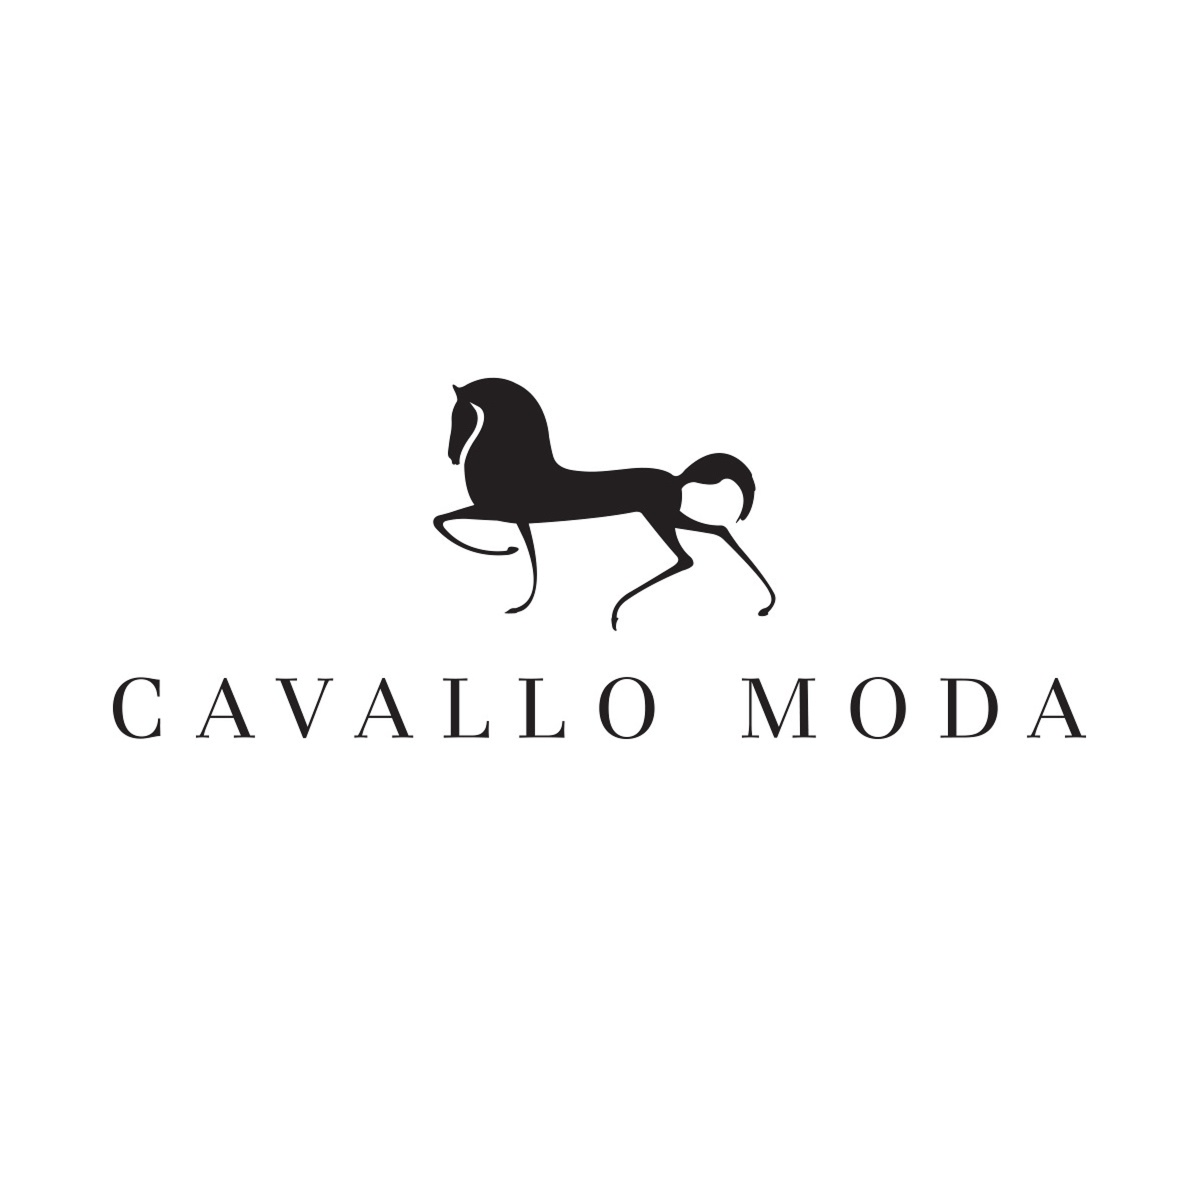 Cavallo Moda